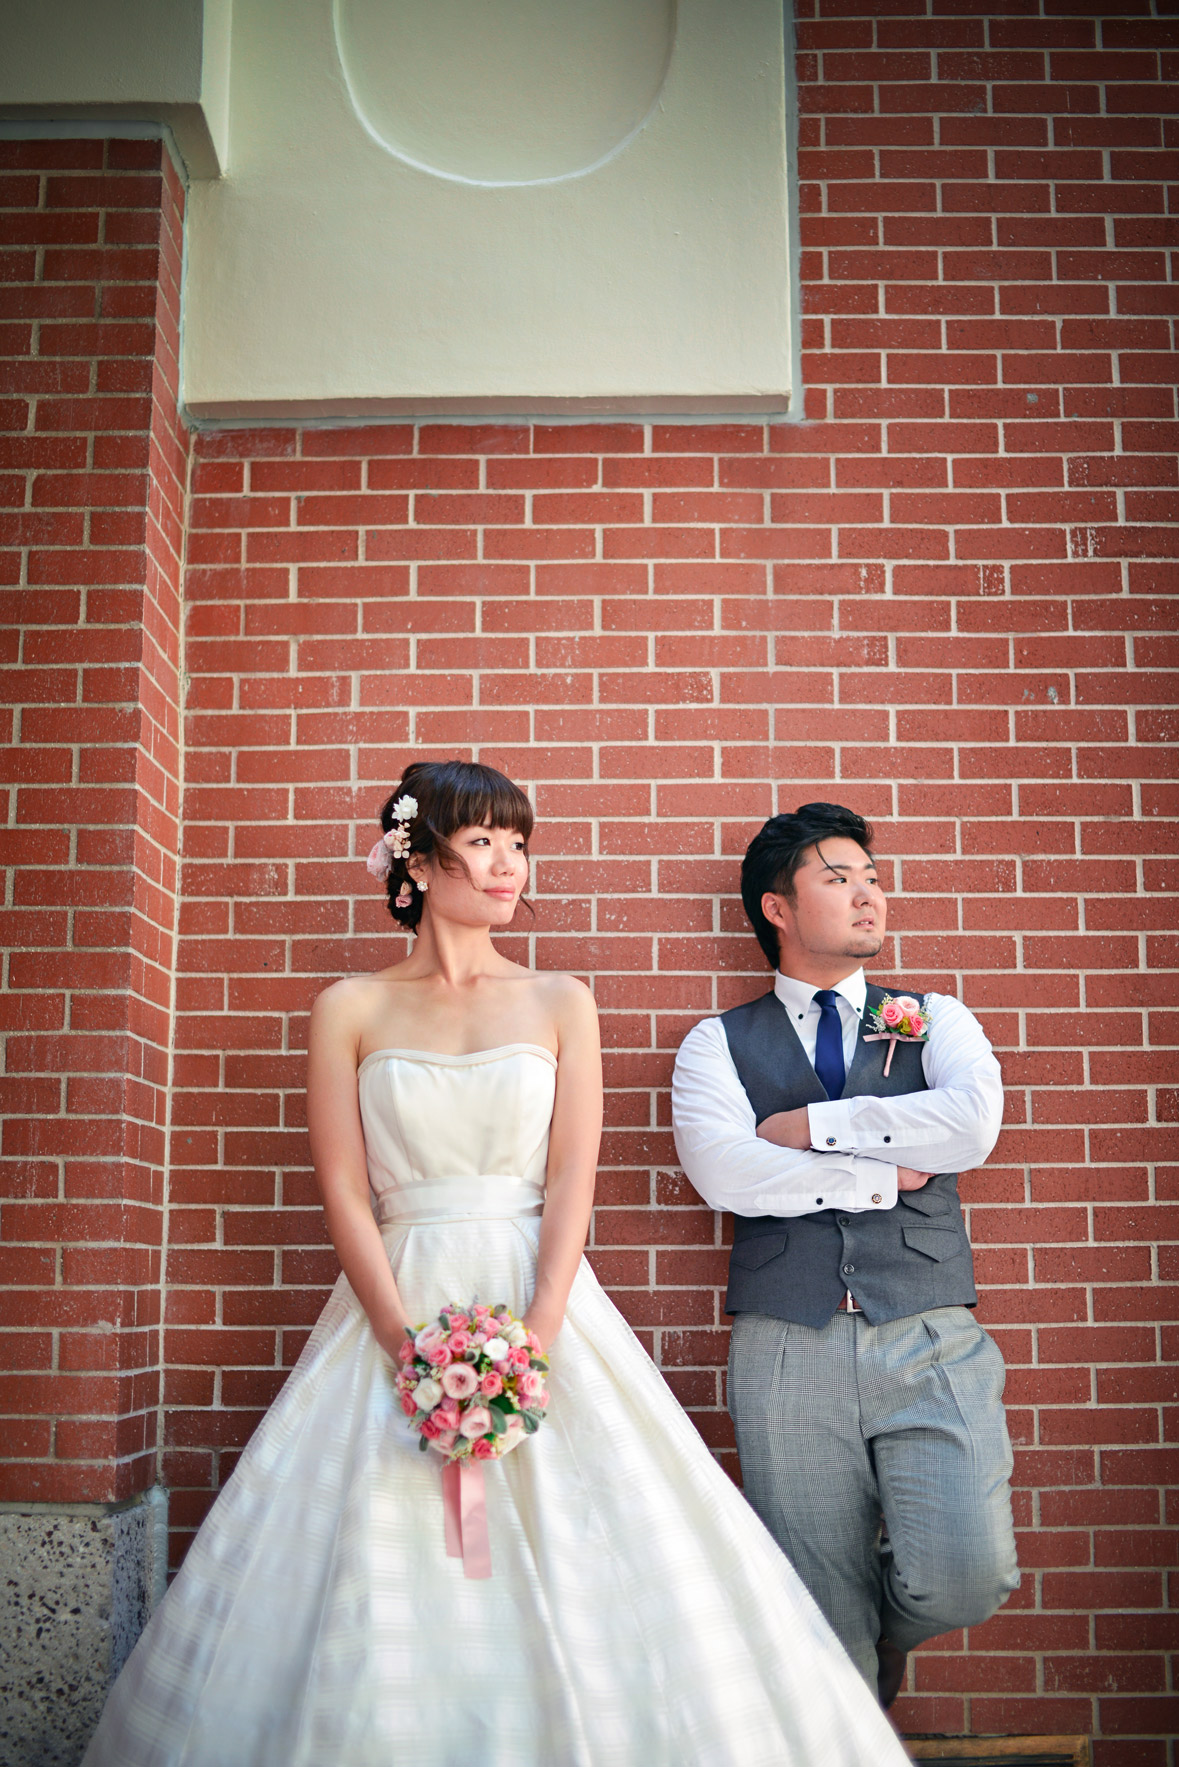 waikiki-beach-wedding-and-downtown-honolulu-hawaii-theater-stephen-ludwig-photography041.jpg